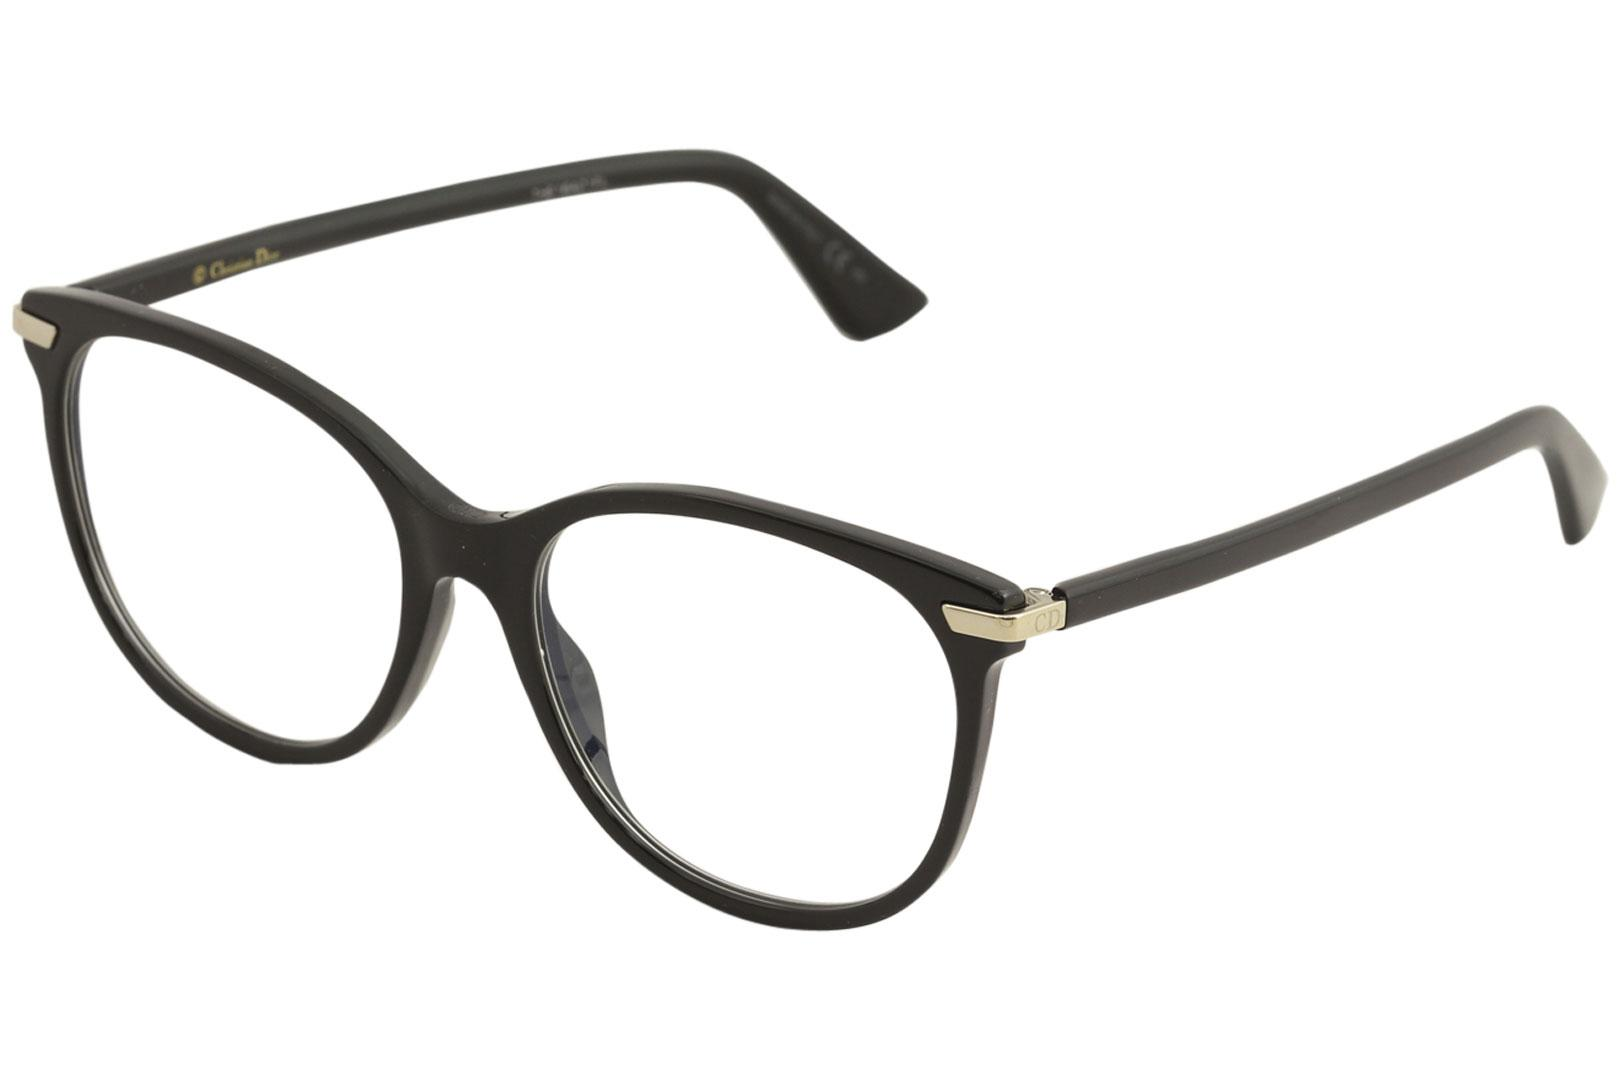 Image of Christian Dior Eyeglasses Women's Dior Essence 11 Full Rim Optical Frame - Black - Lens 53 Bridge 17 Temple 145mm